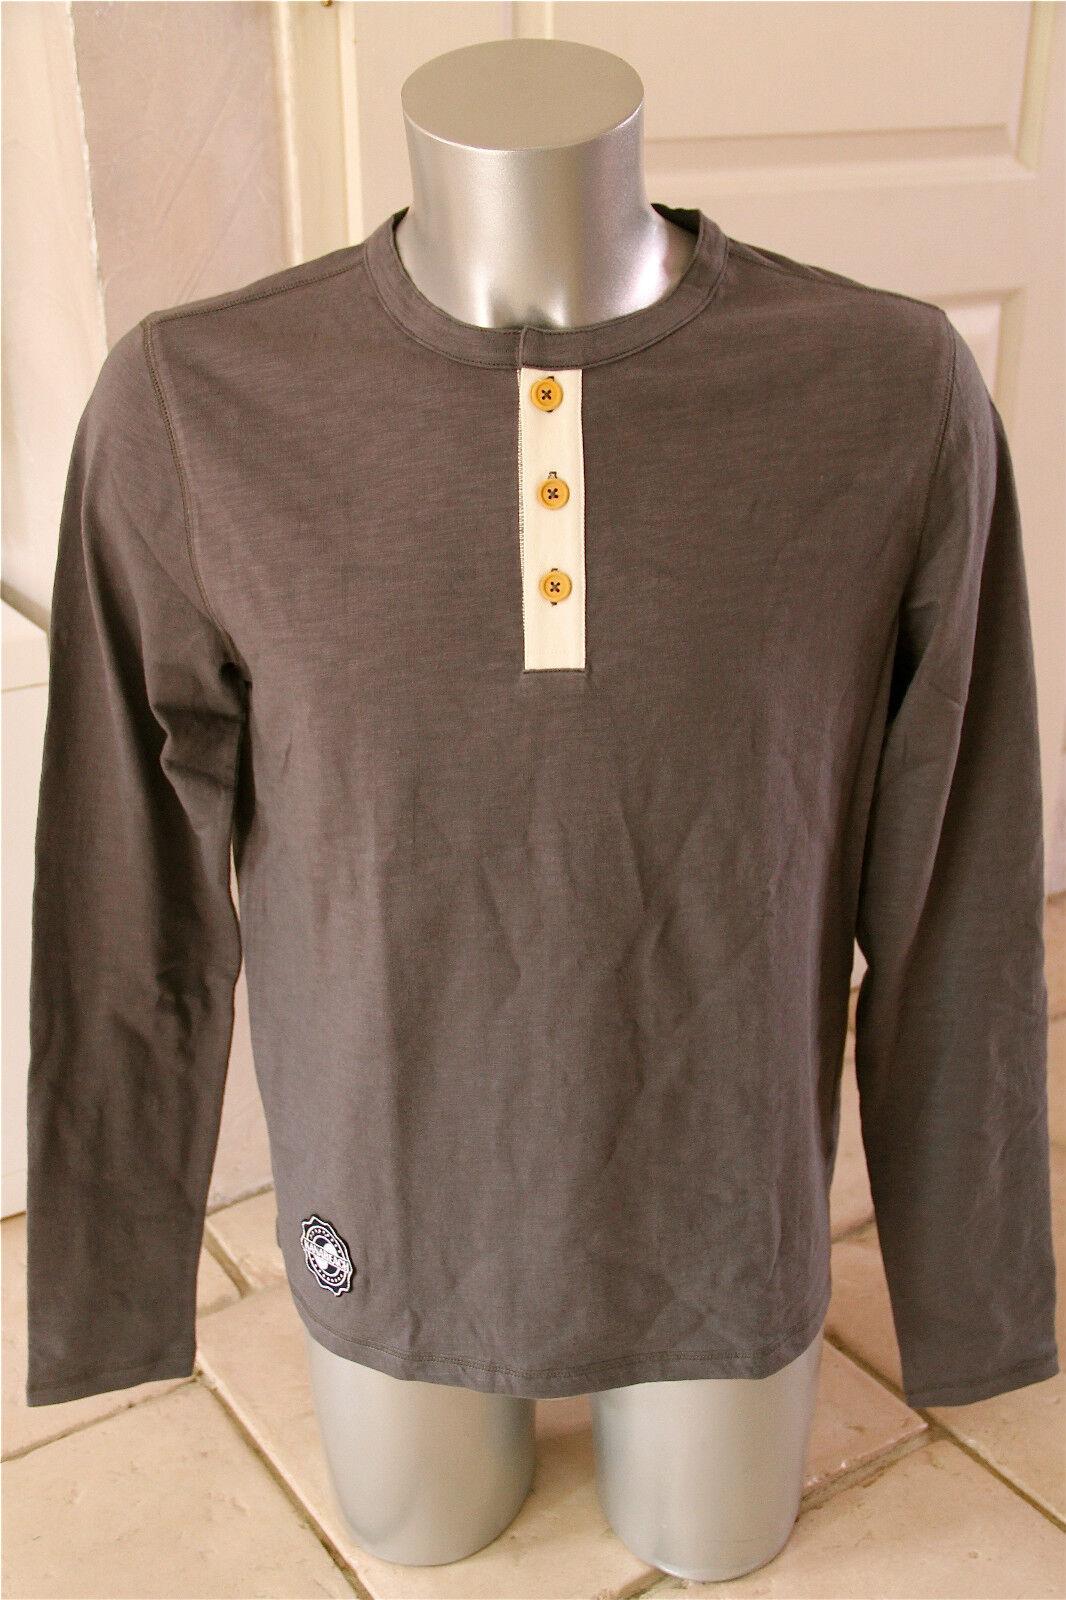 Sweat sweater hemp KANABEACH BIOLOGIK ping SIZE M NEW LABEL value